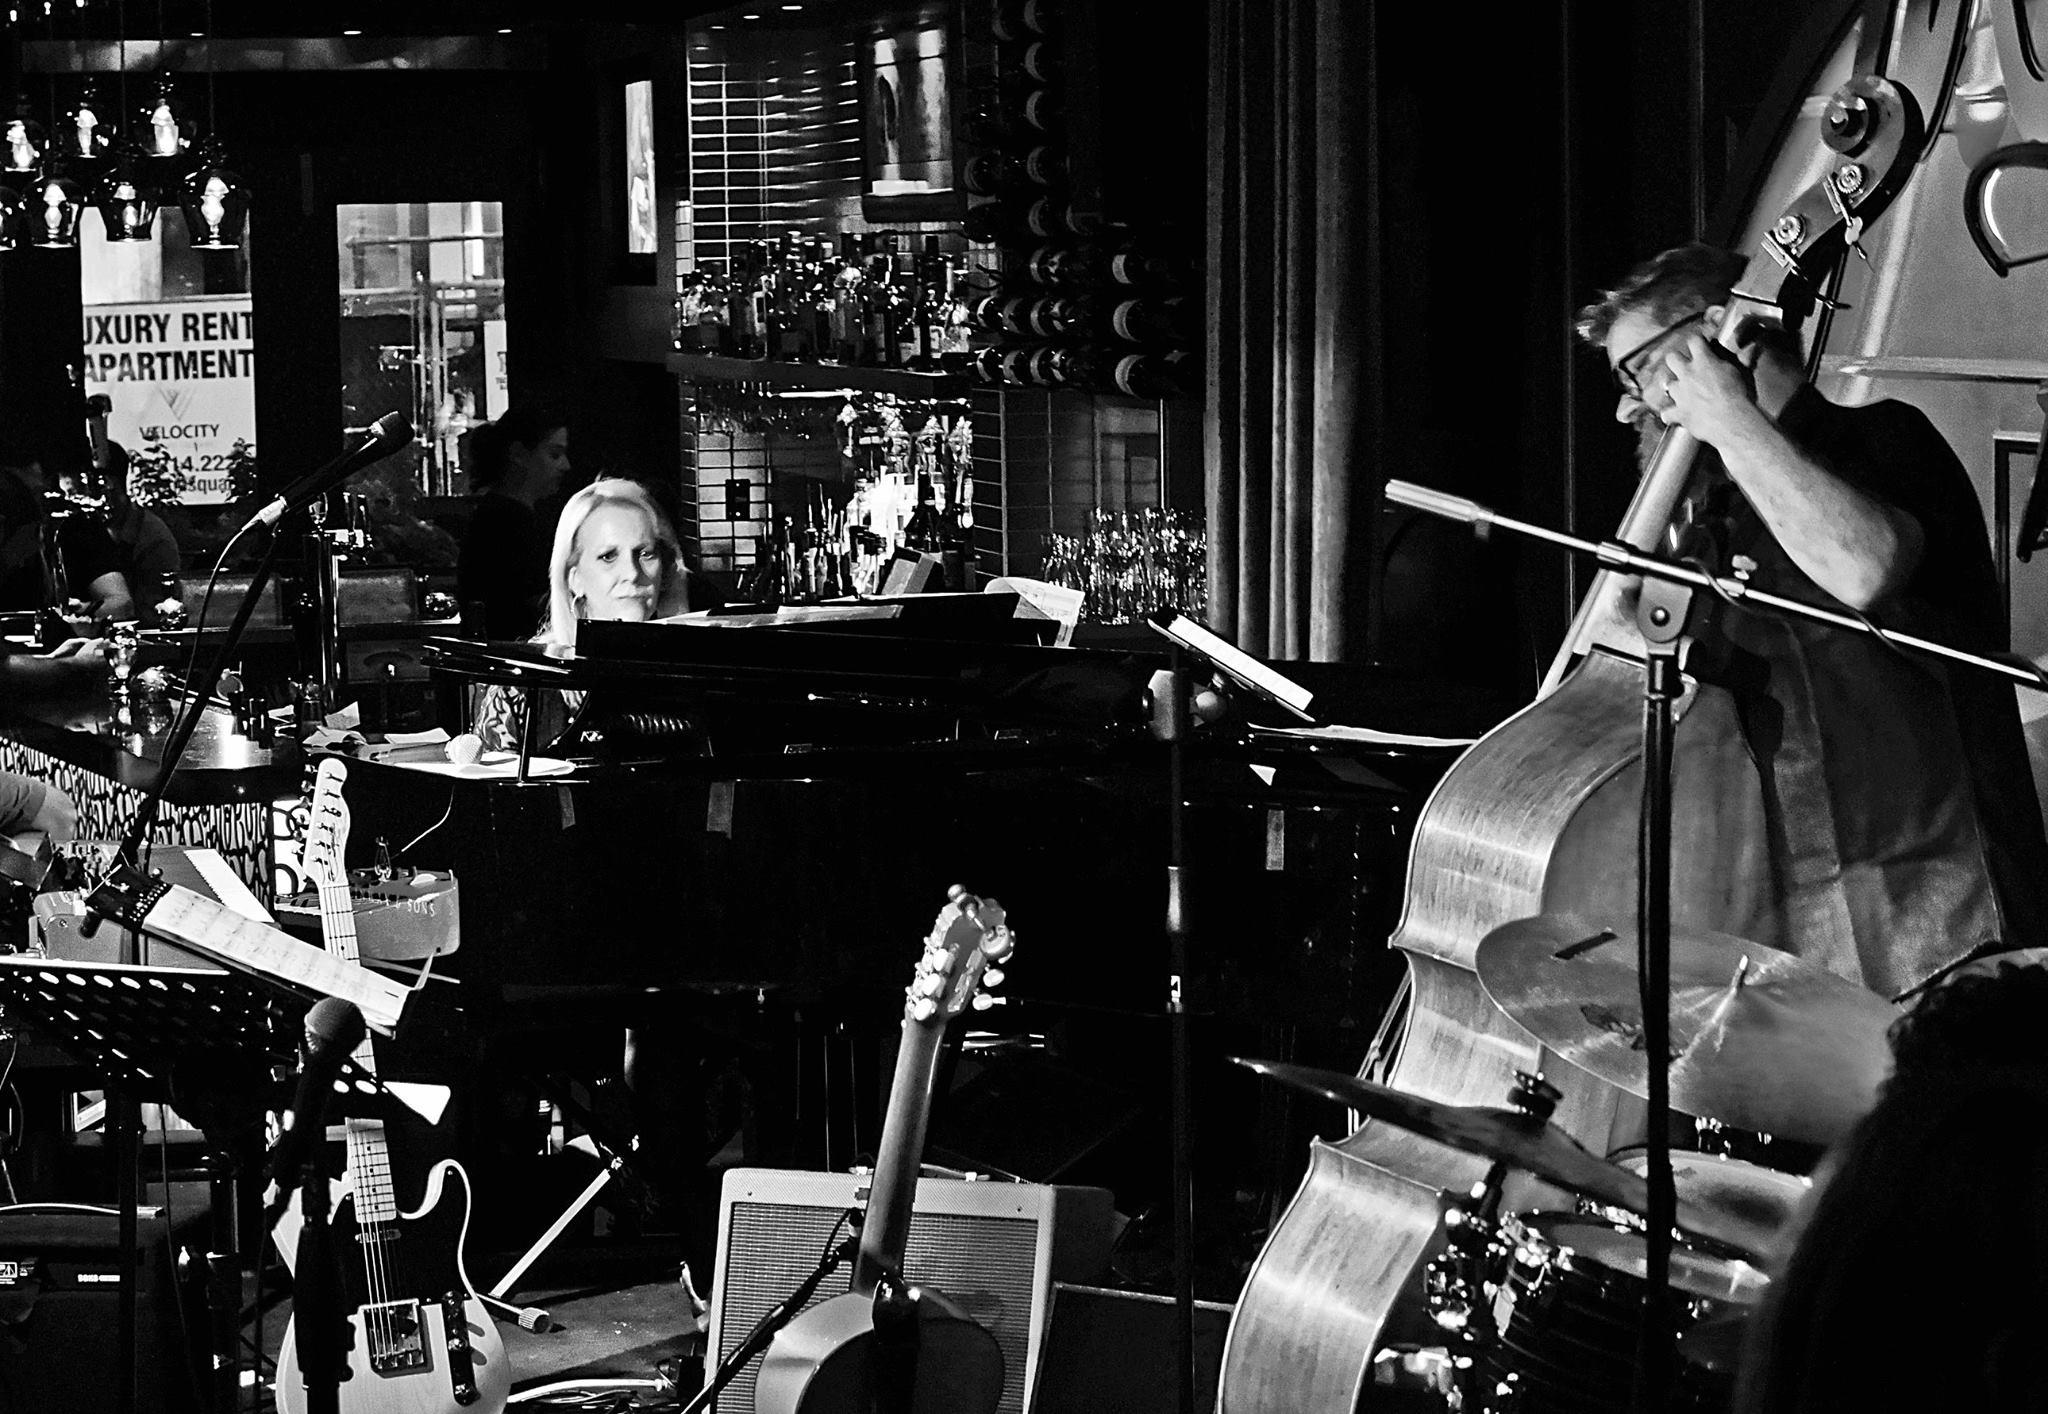 Photographing Sunnie Paxson, Jazz pianist from L.A. Jazz Bistro, Toronto.